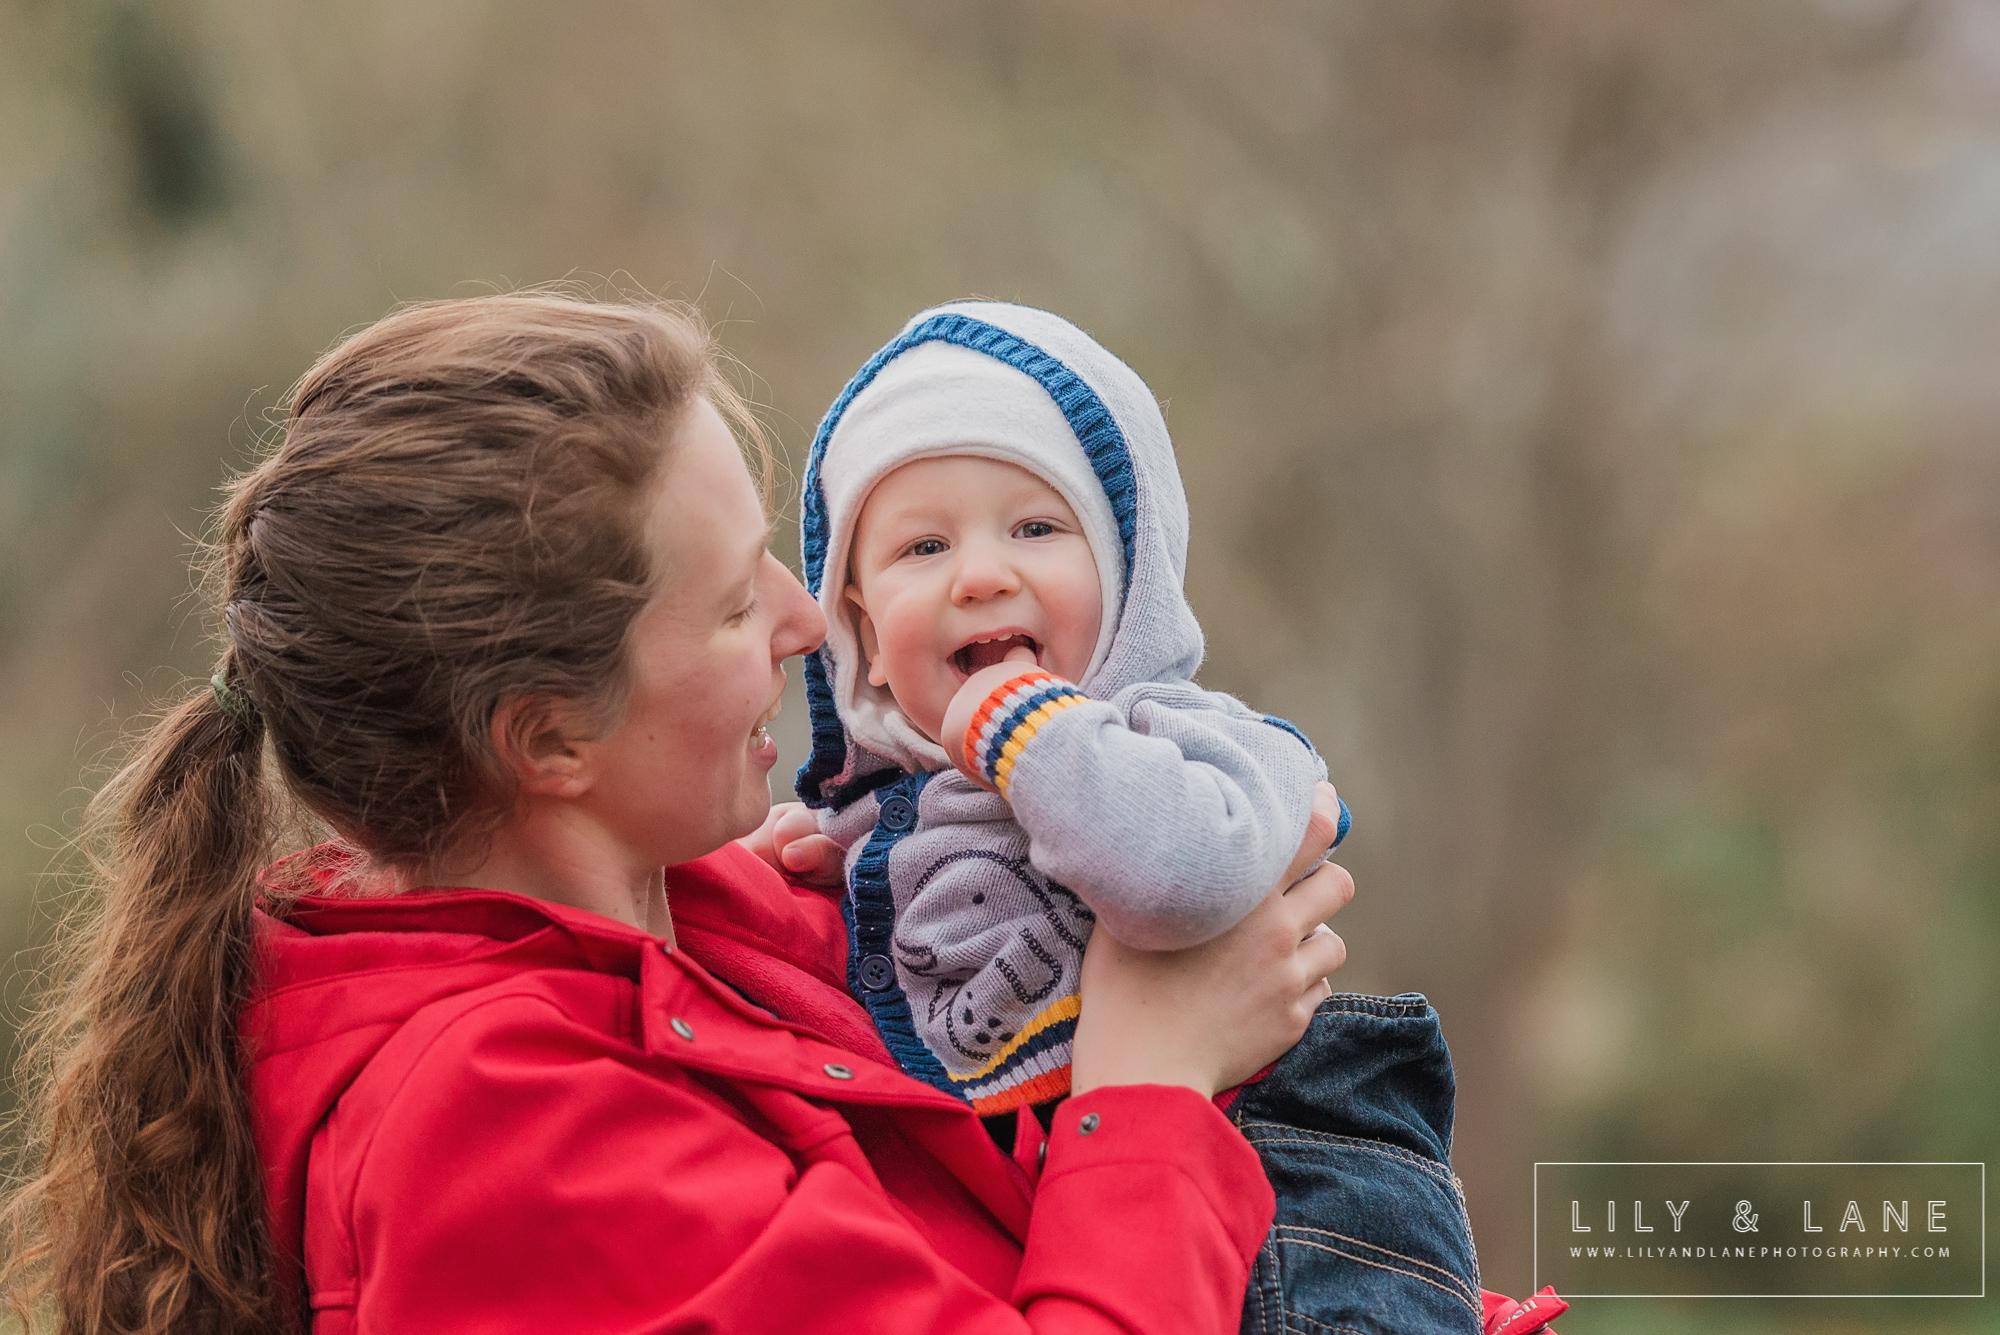 LilyandLane_VictoriaBC_ChildrensPhotography (17).jpg